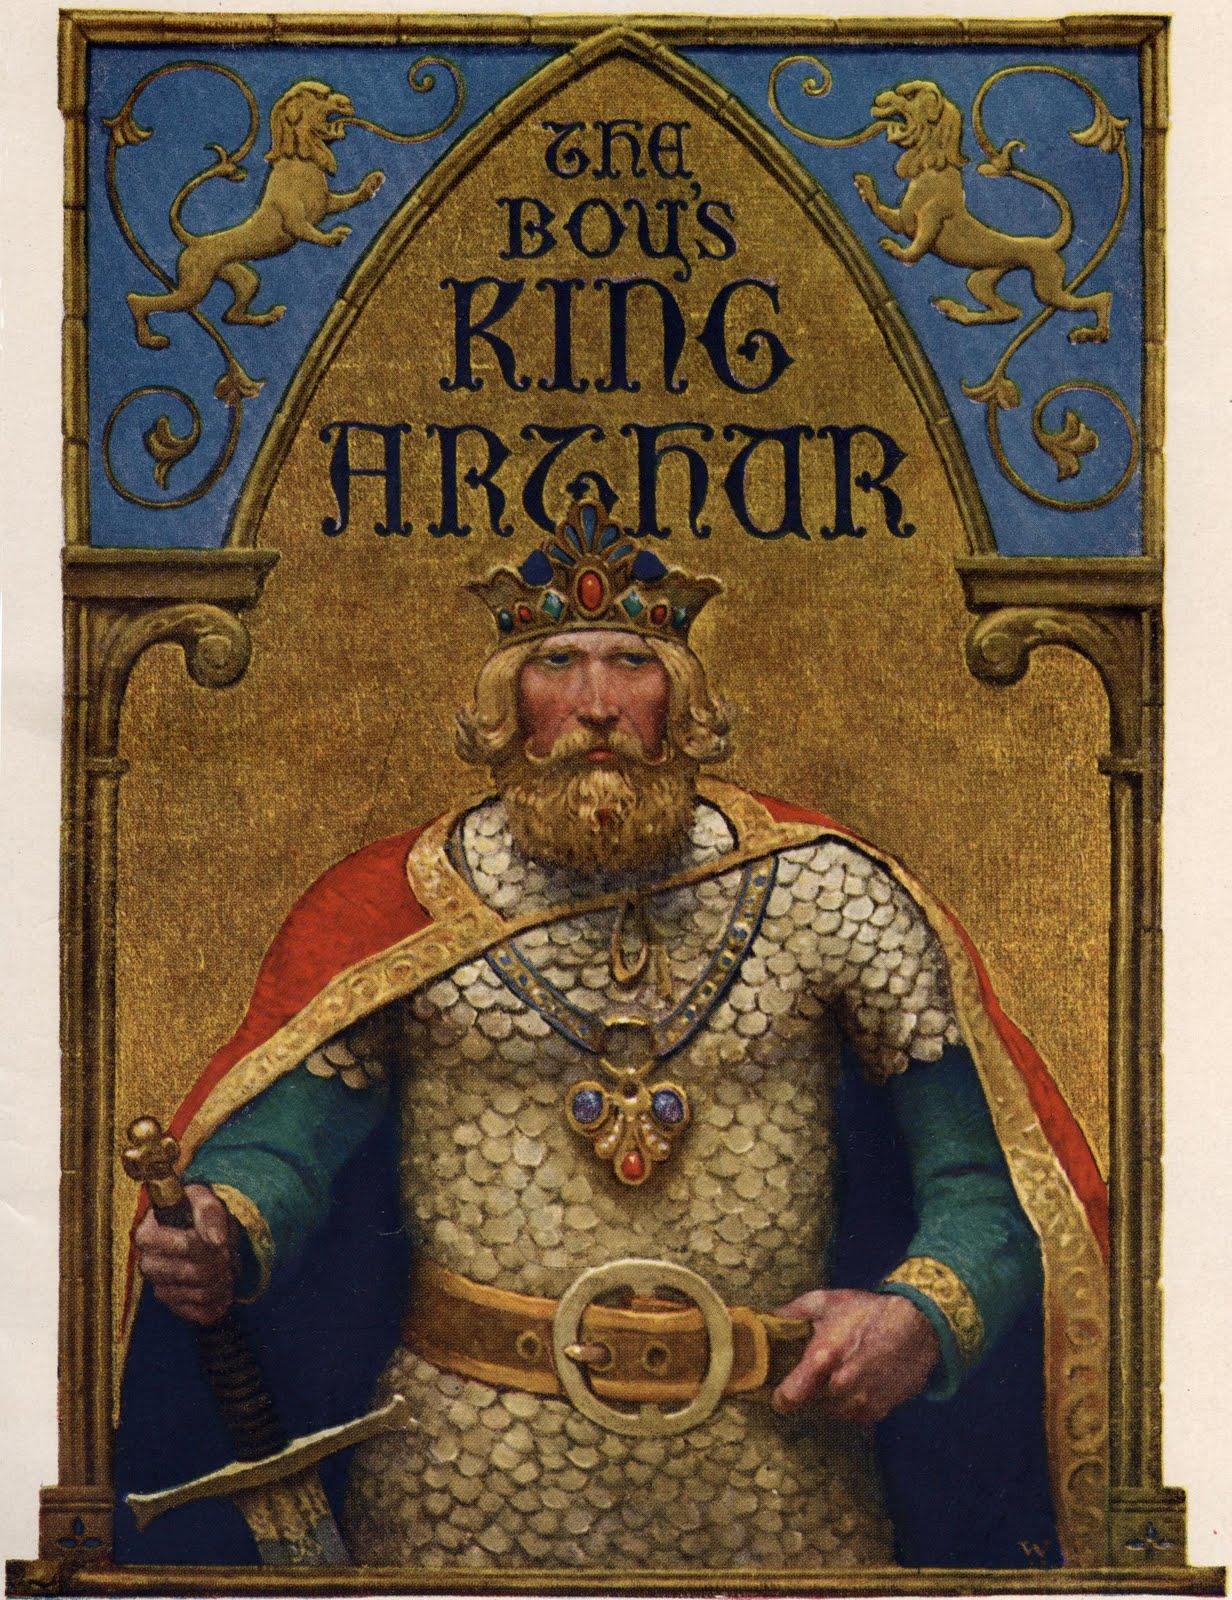 was king arthur real essay